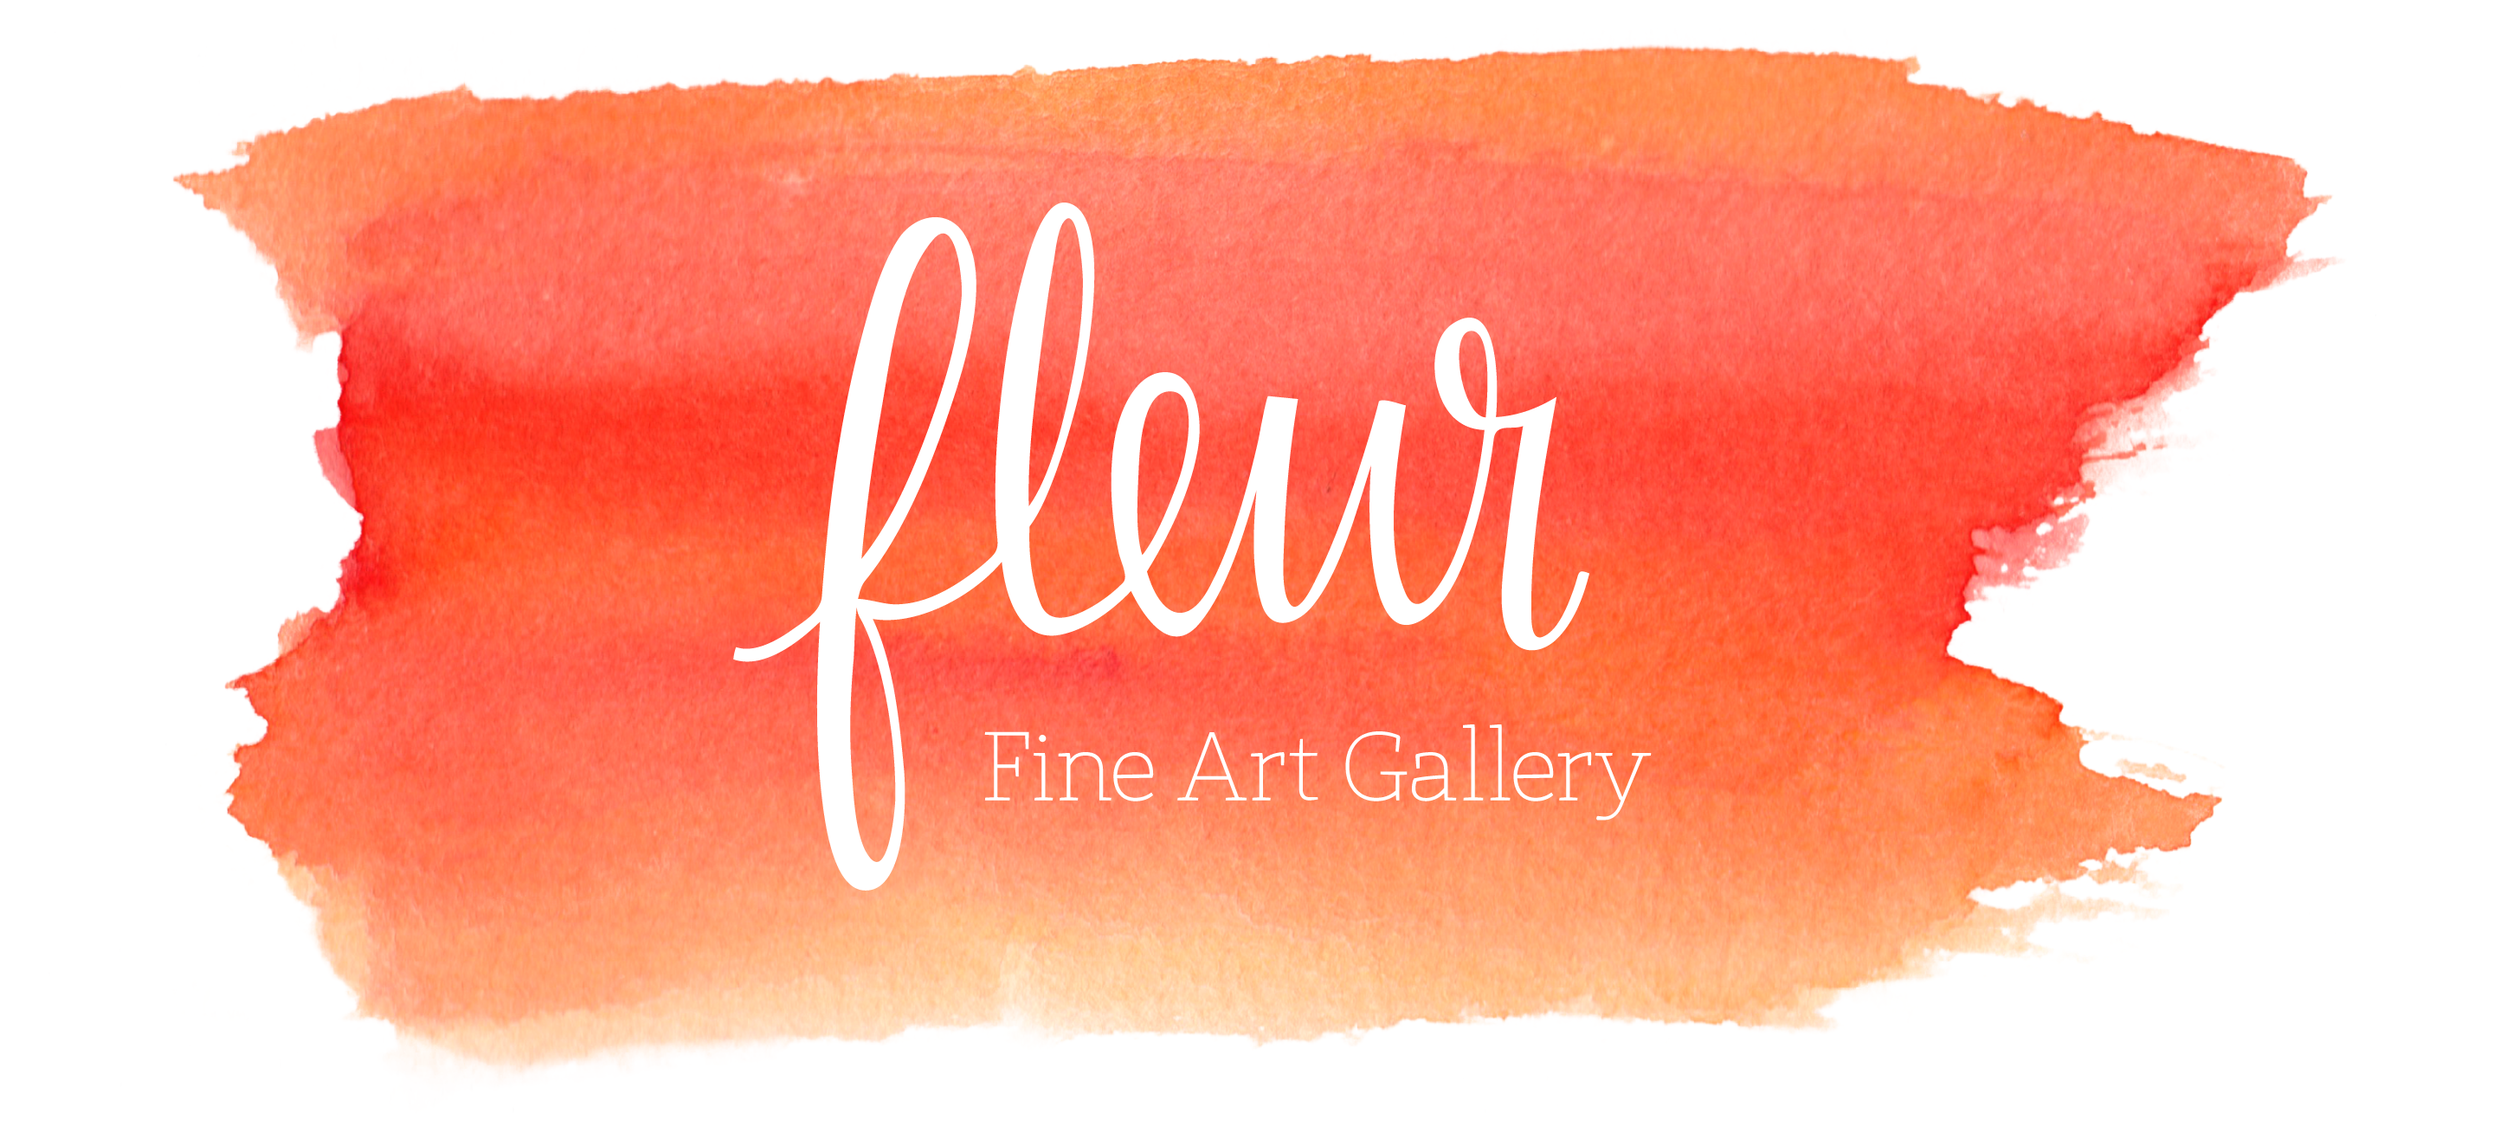 fleur-fine-art.png